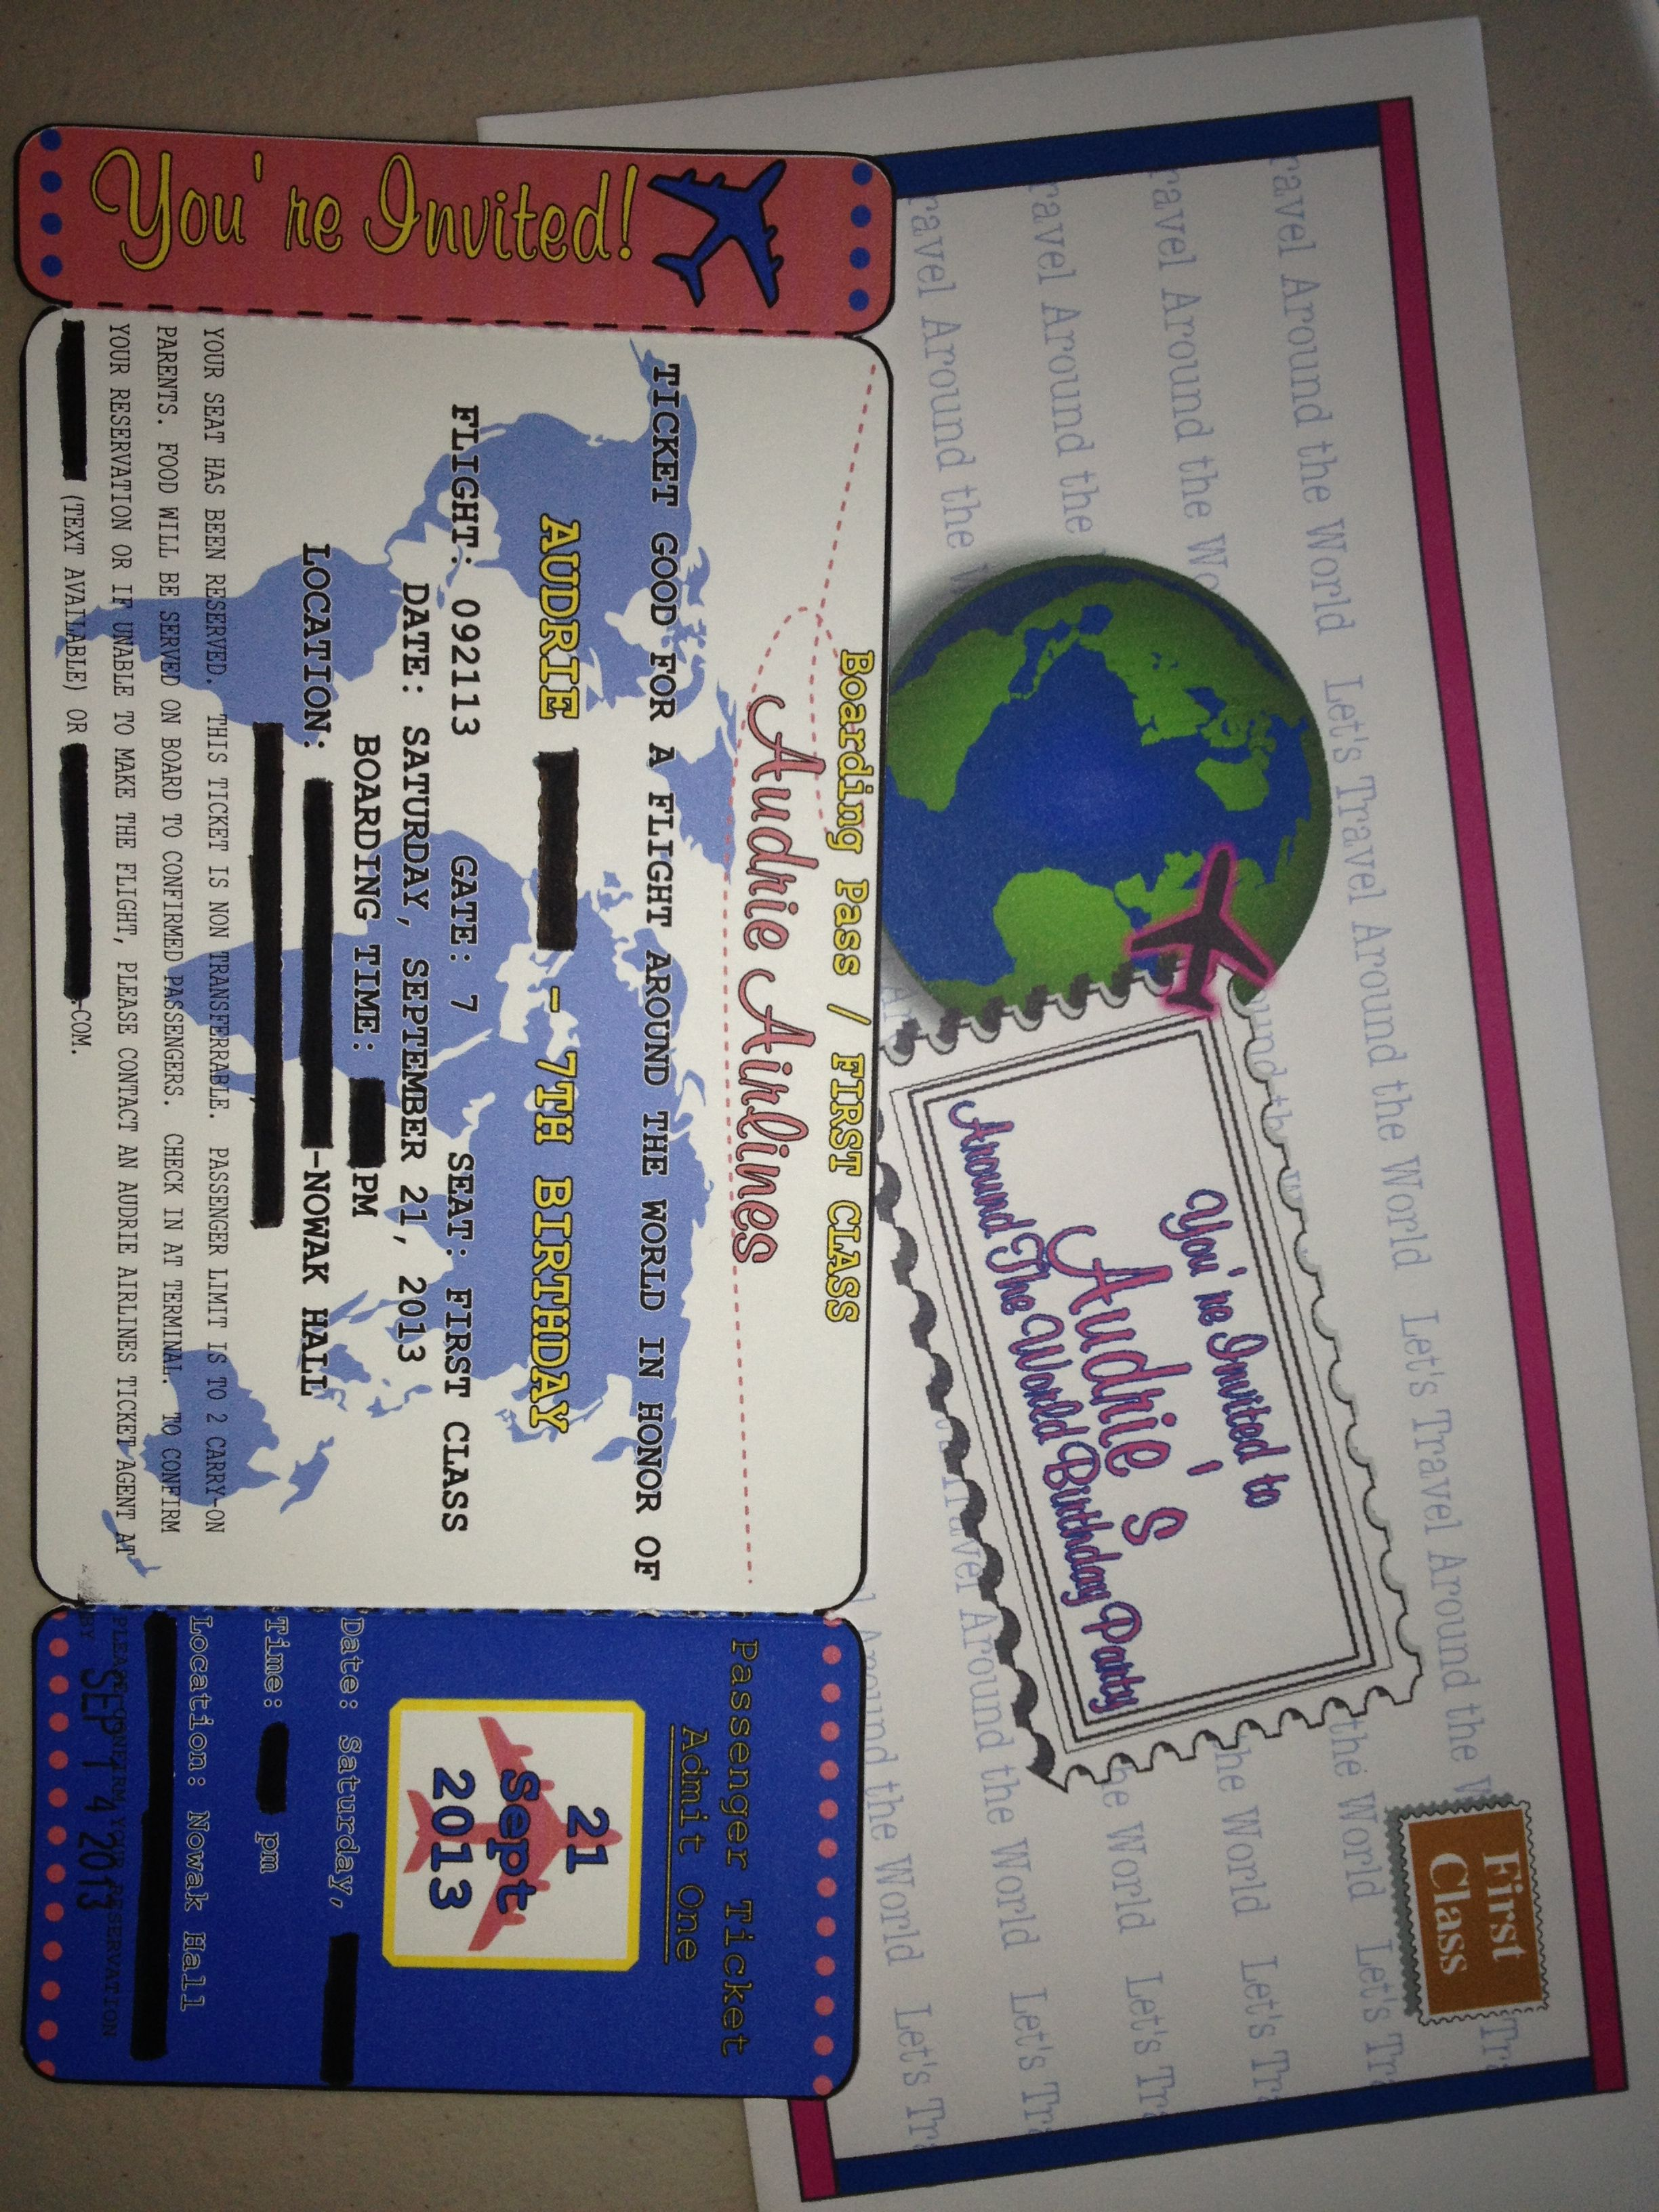 Around The World Dinner Party Ideas Part - 26: Around The World Party Invitation